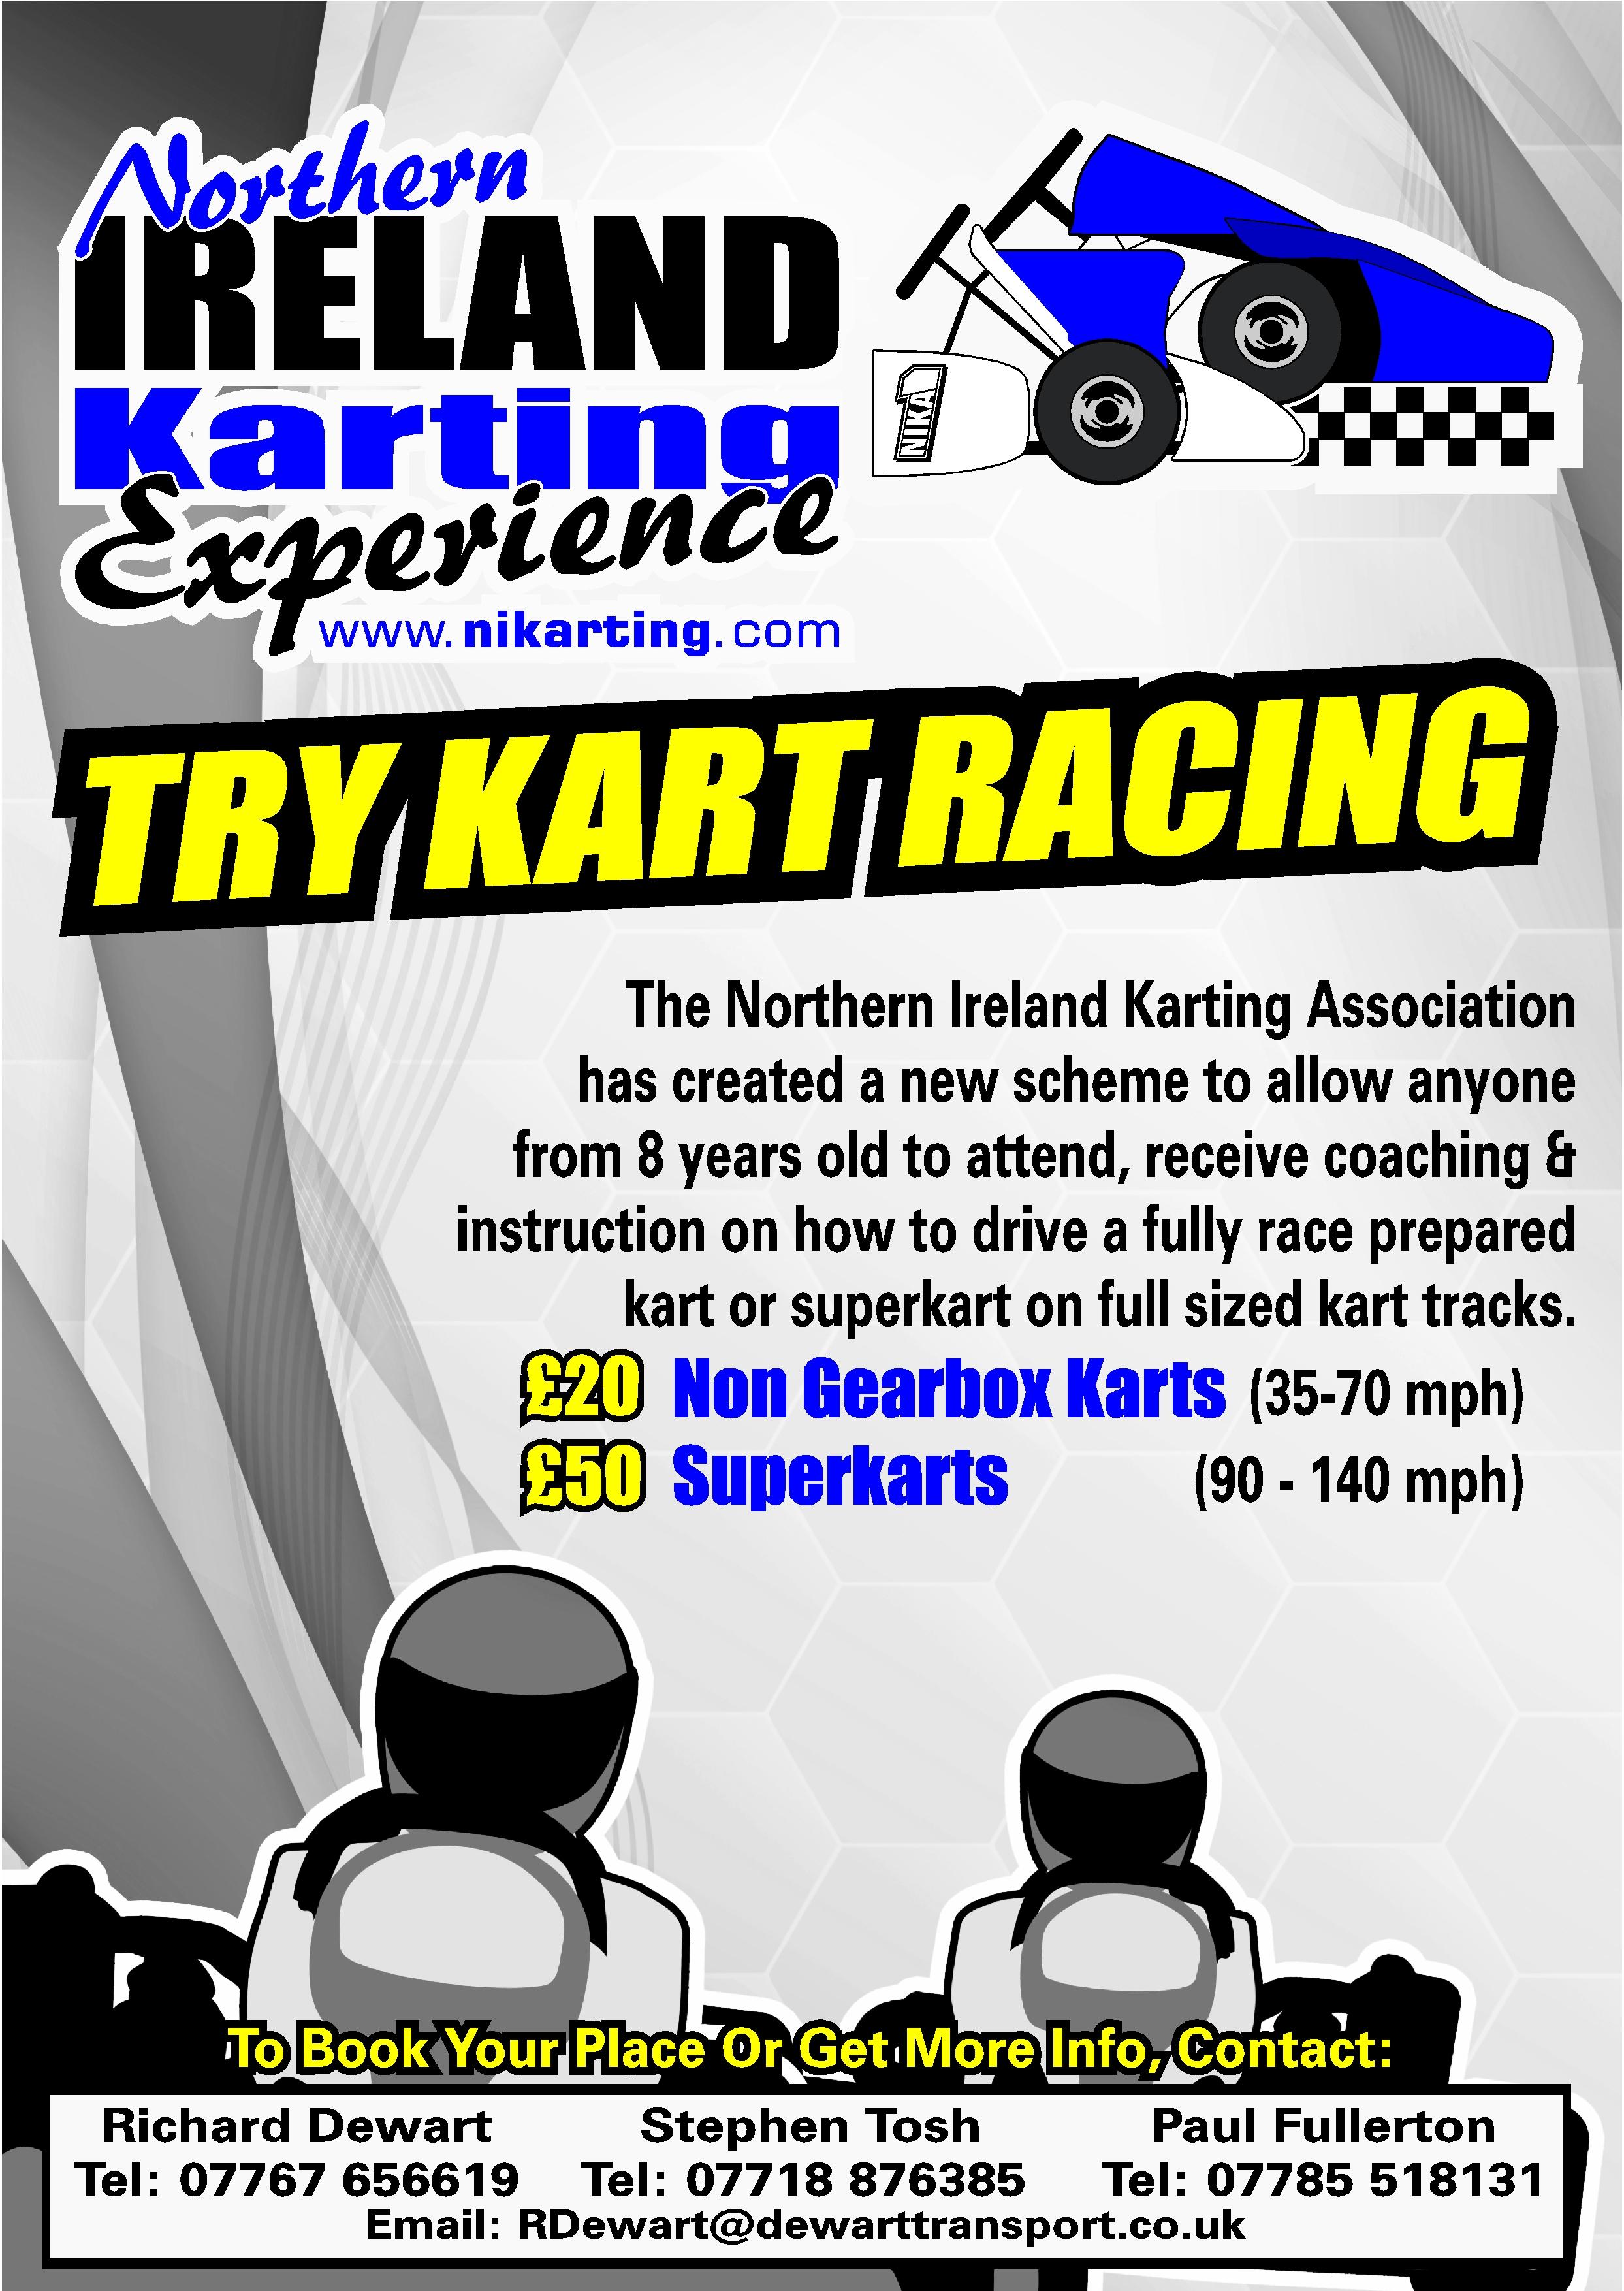 NIKE-Race-Leaflet-2014